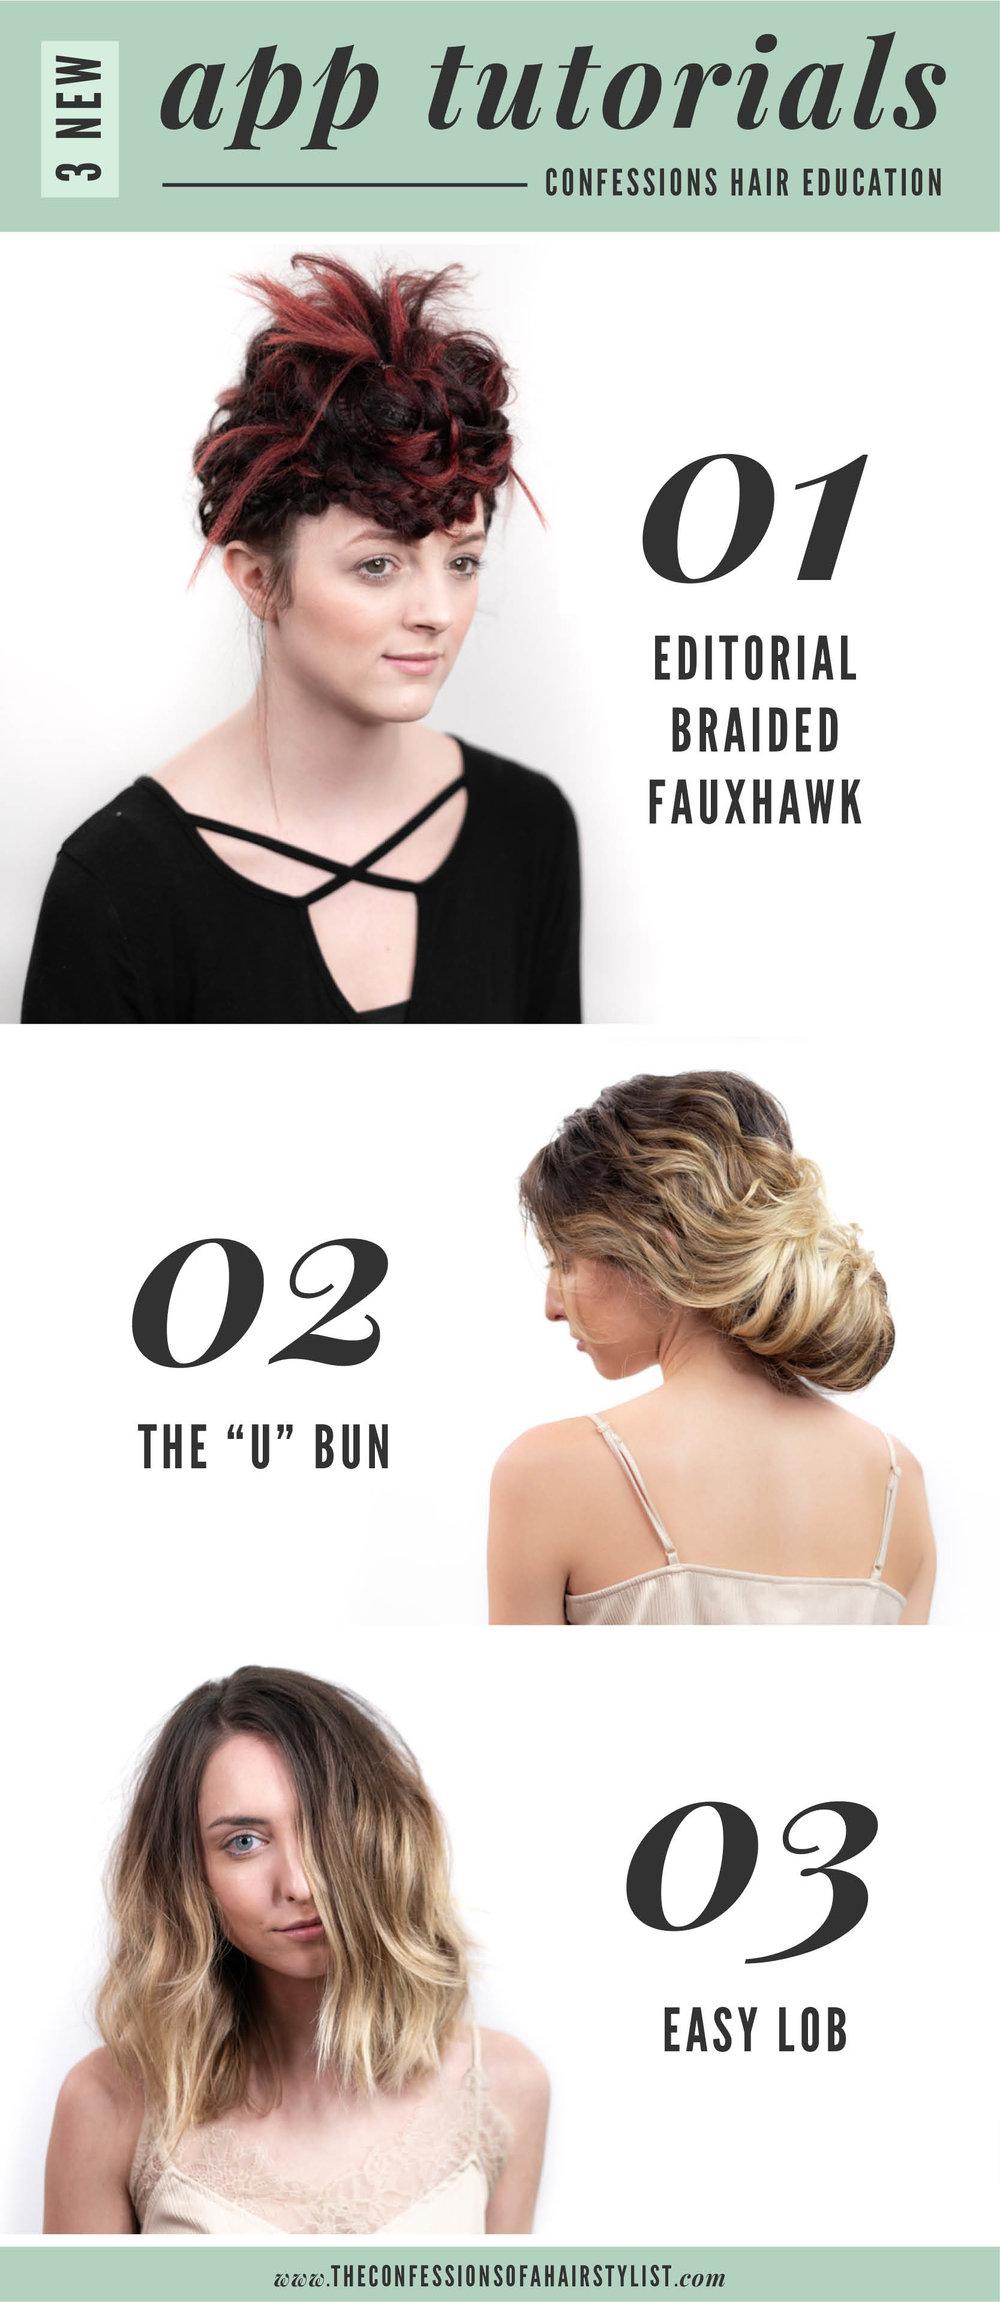 Editorial Braided Fauxhawk by Nuvia, The U Bun and an Easy Lob